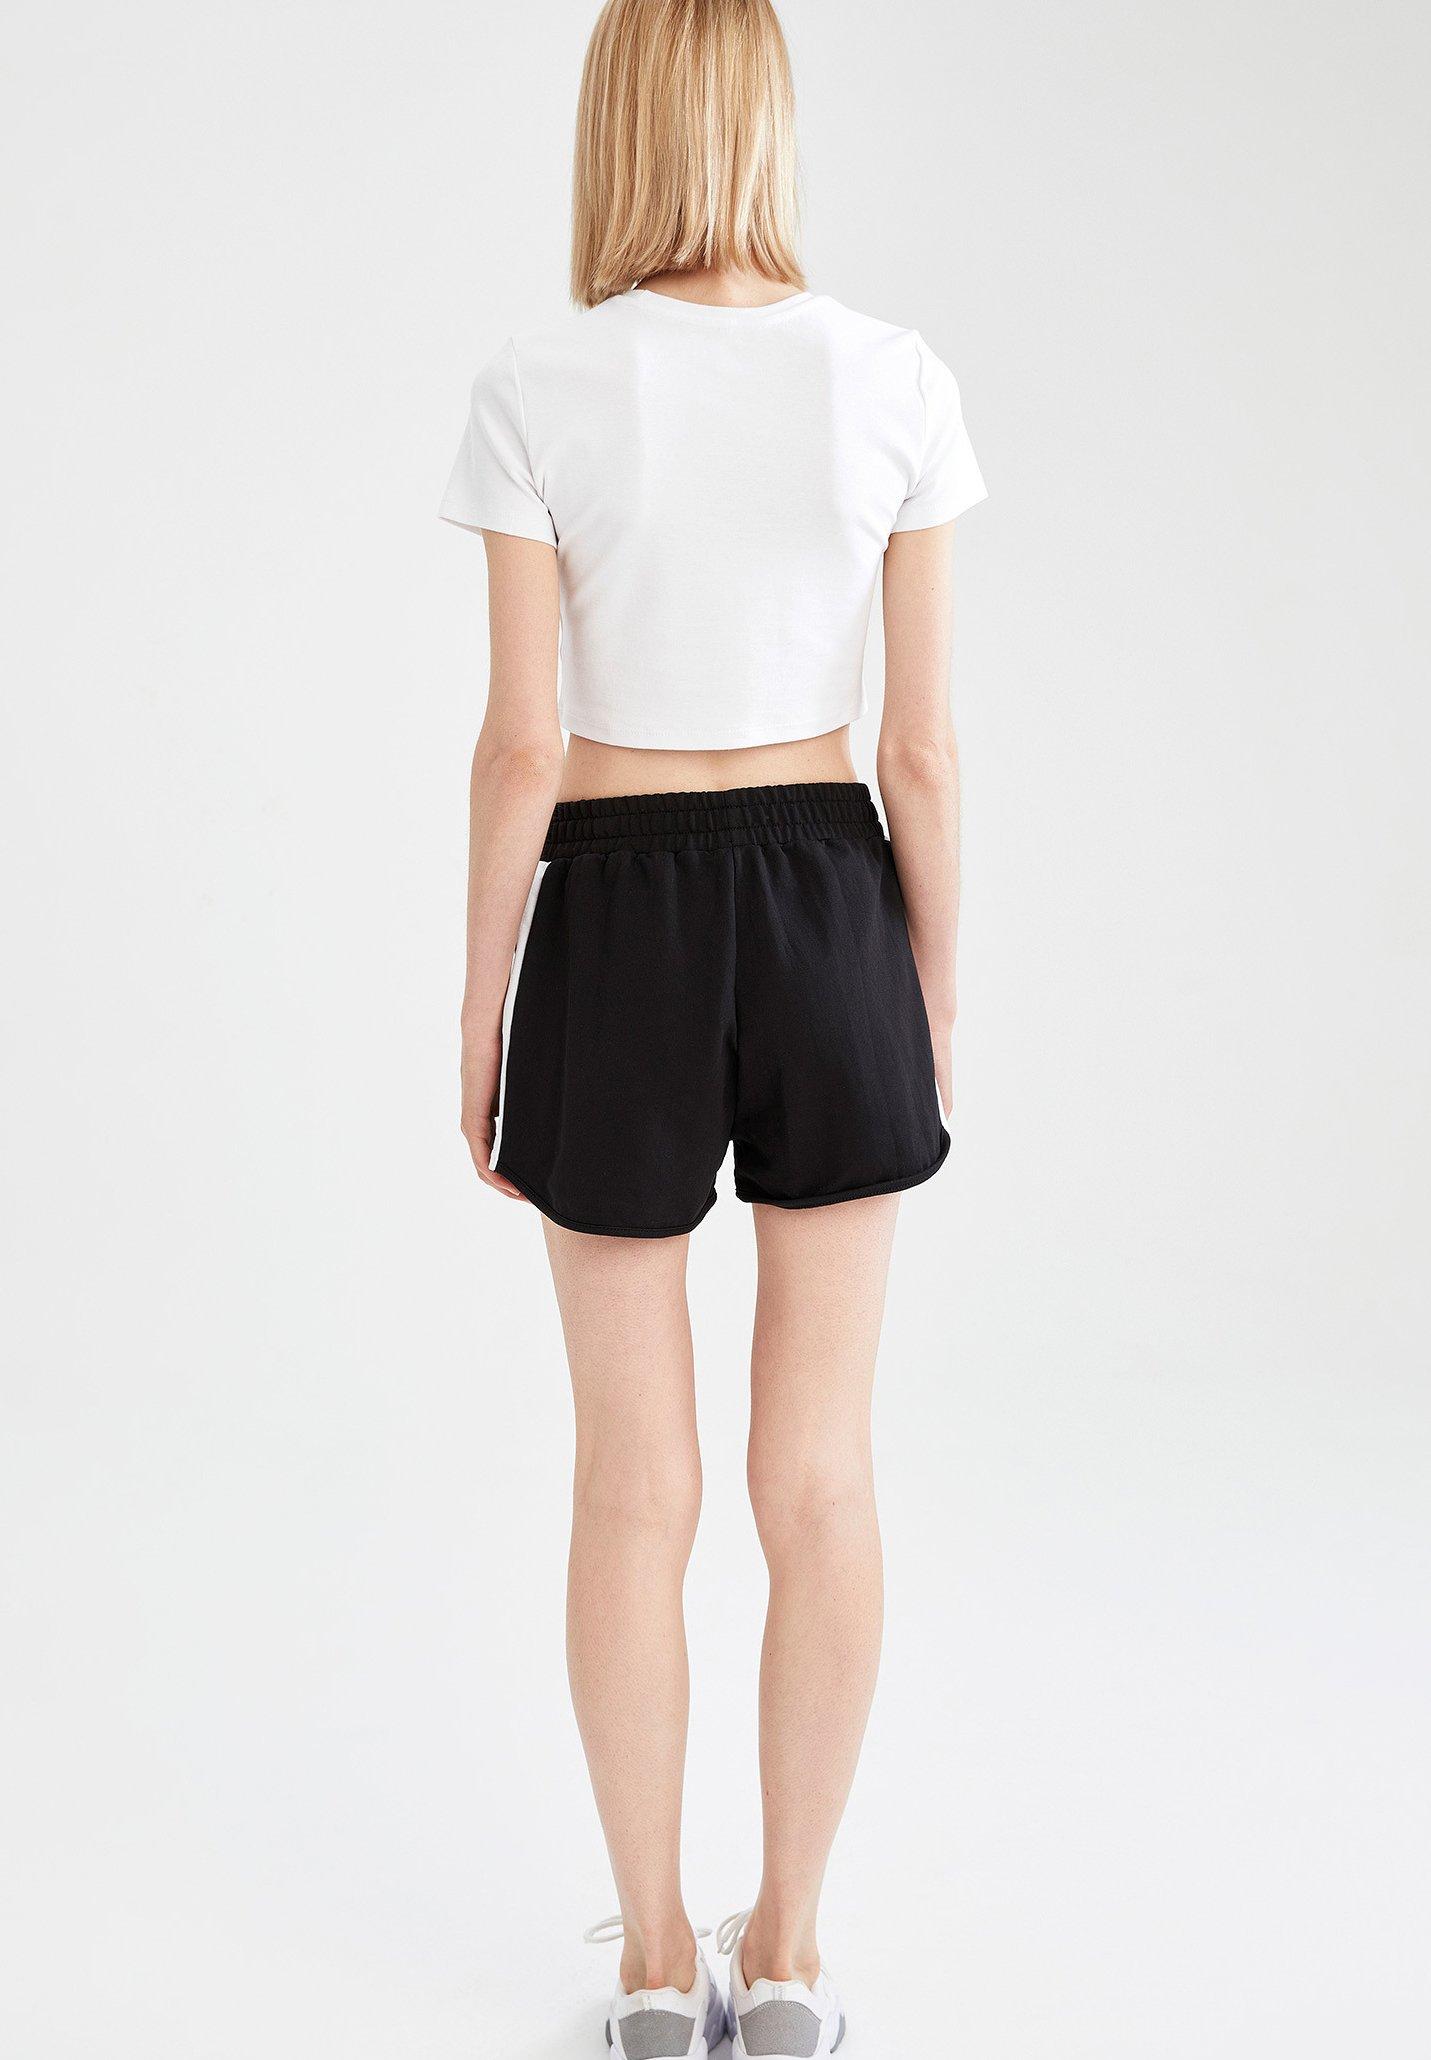 Damen REGULAR FIT  - kurze Sporthose